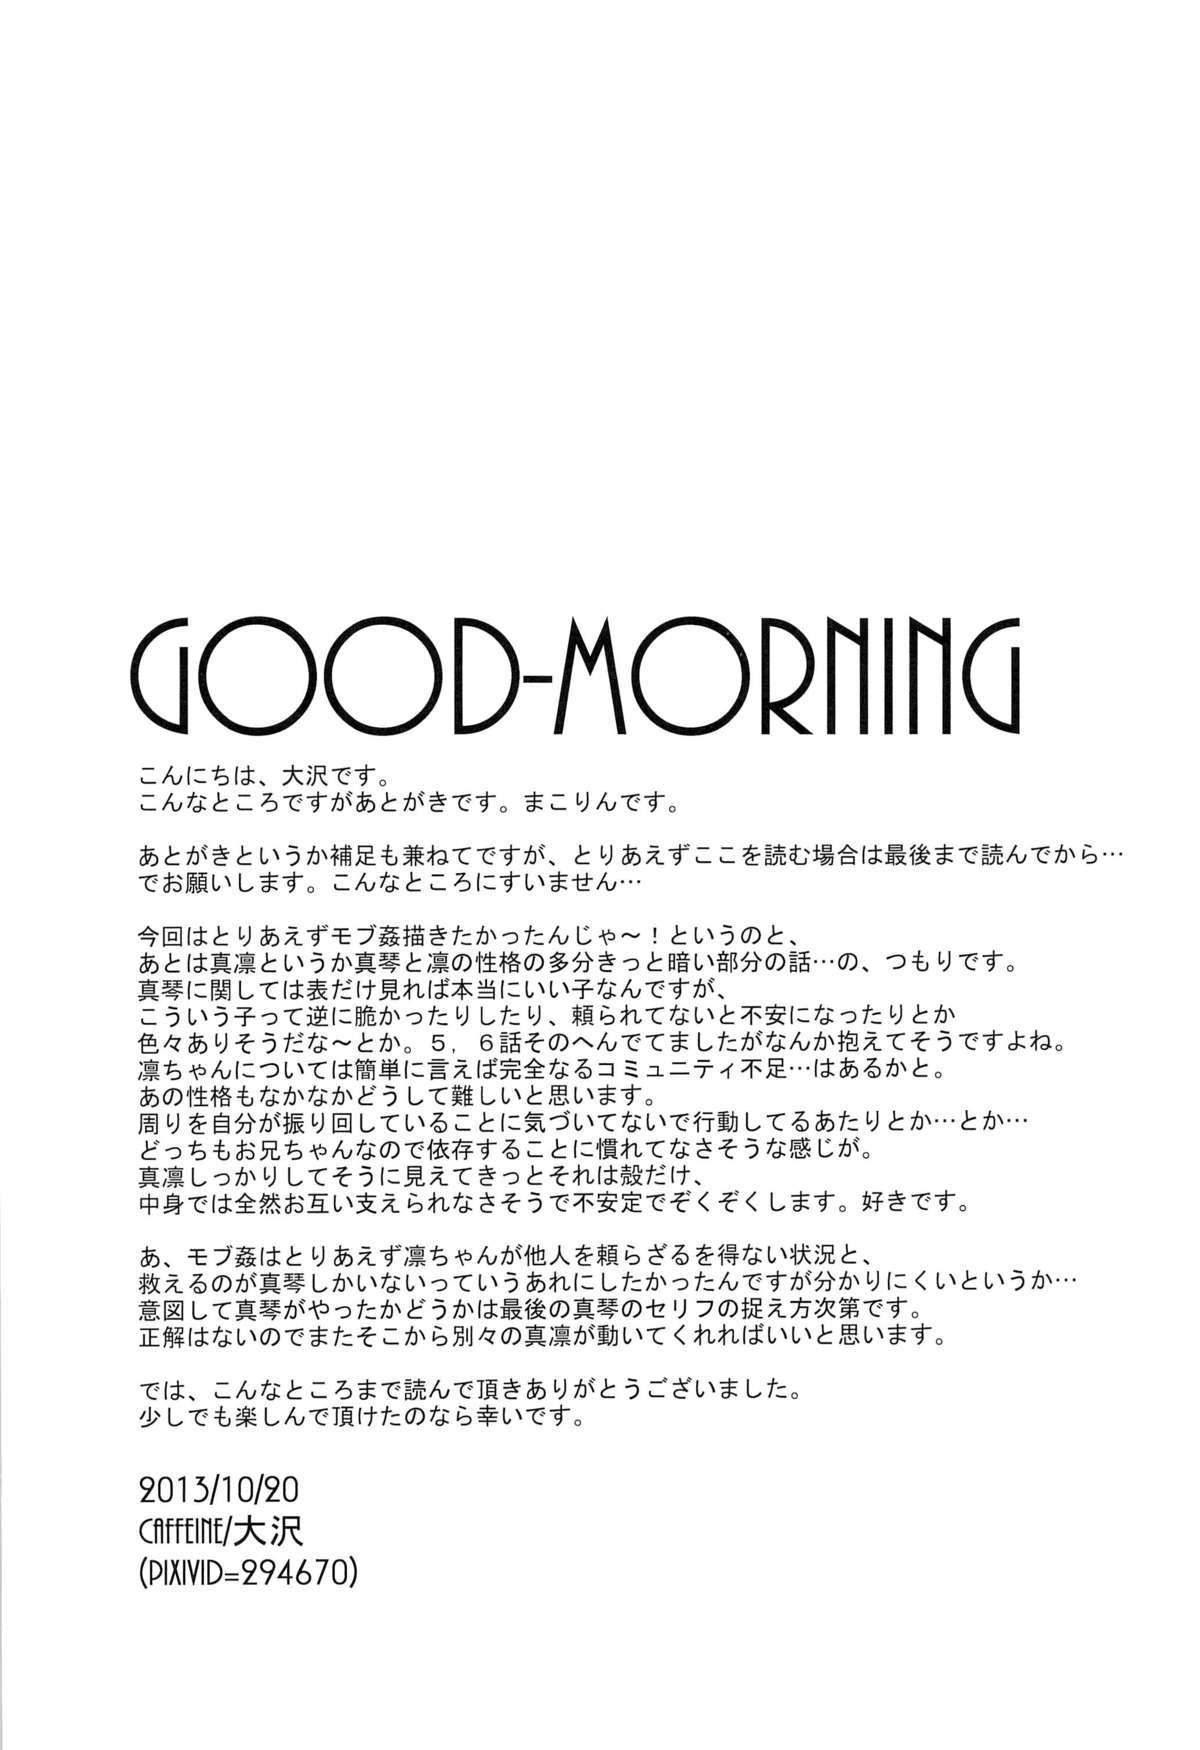 GOOD-MORNING 37